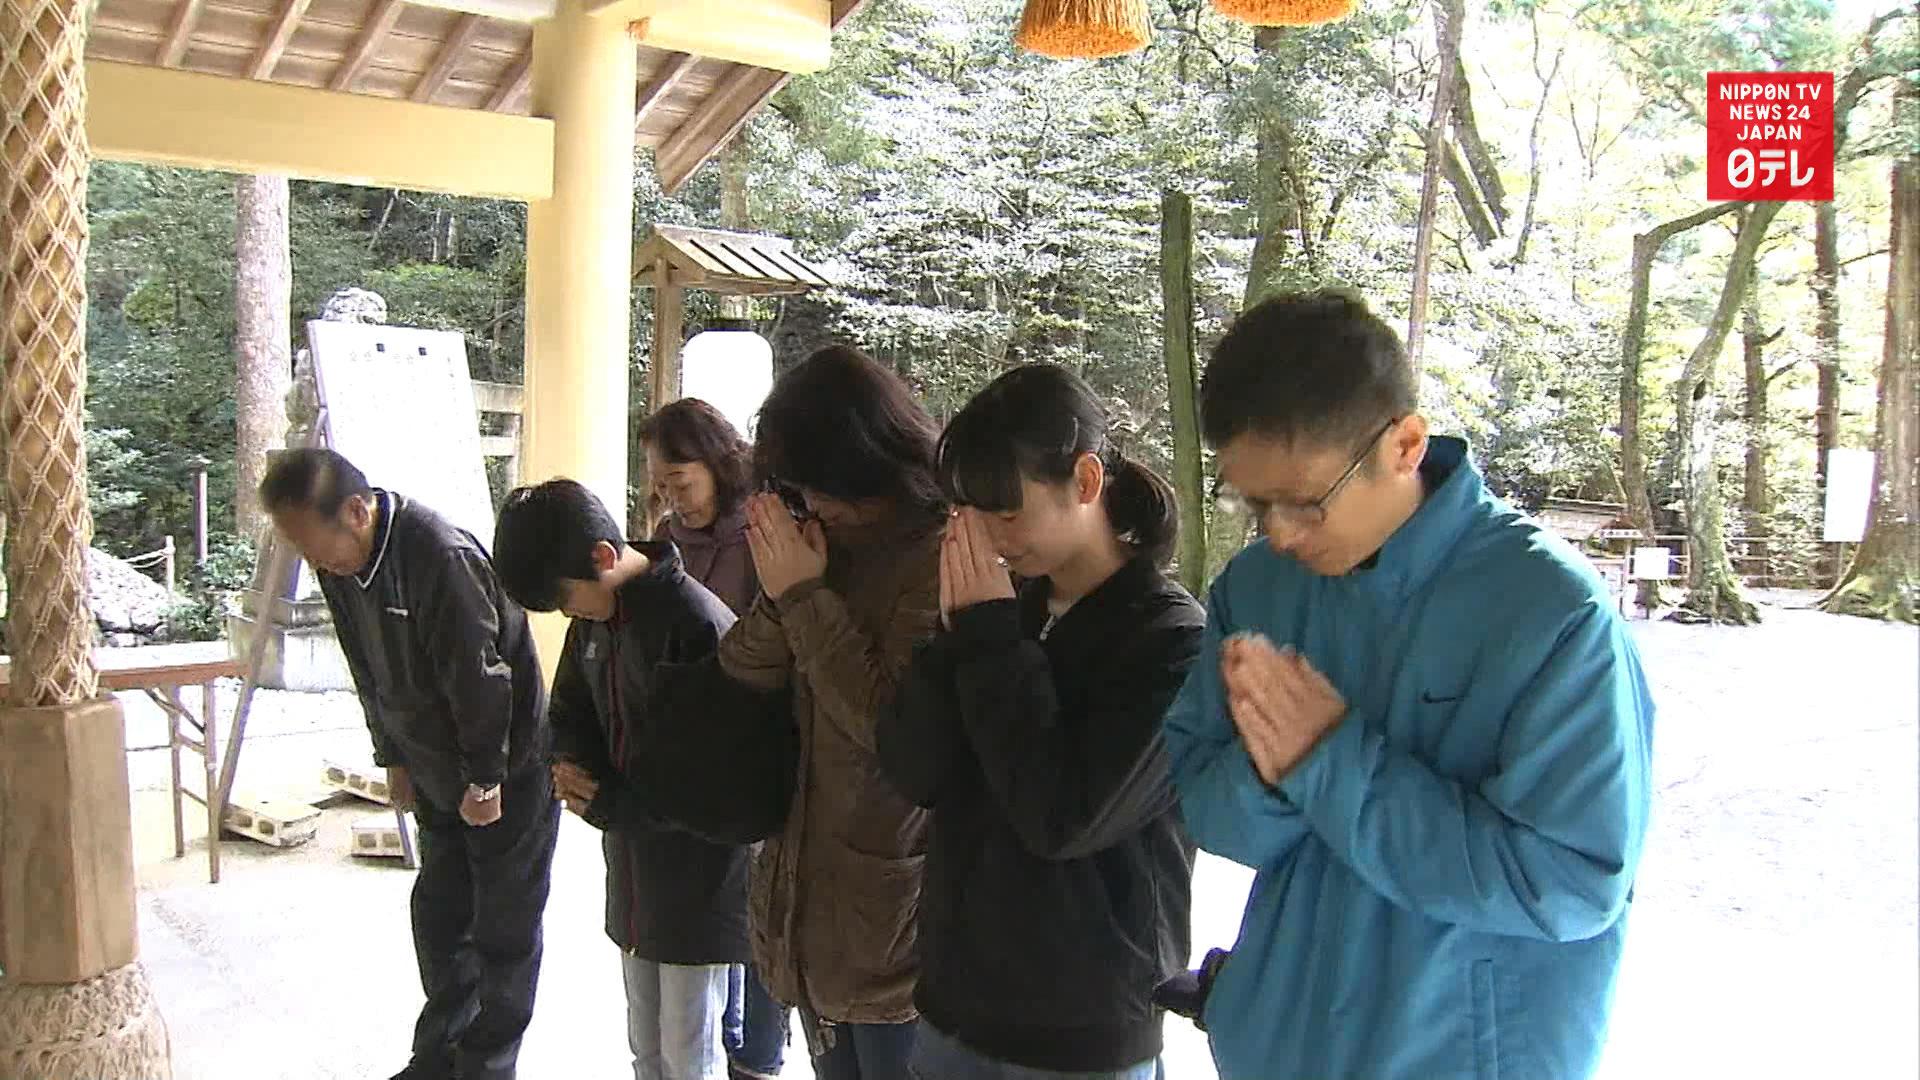 Entrance exam prayers